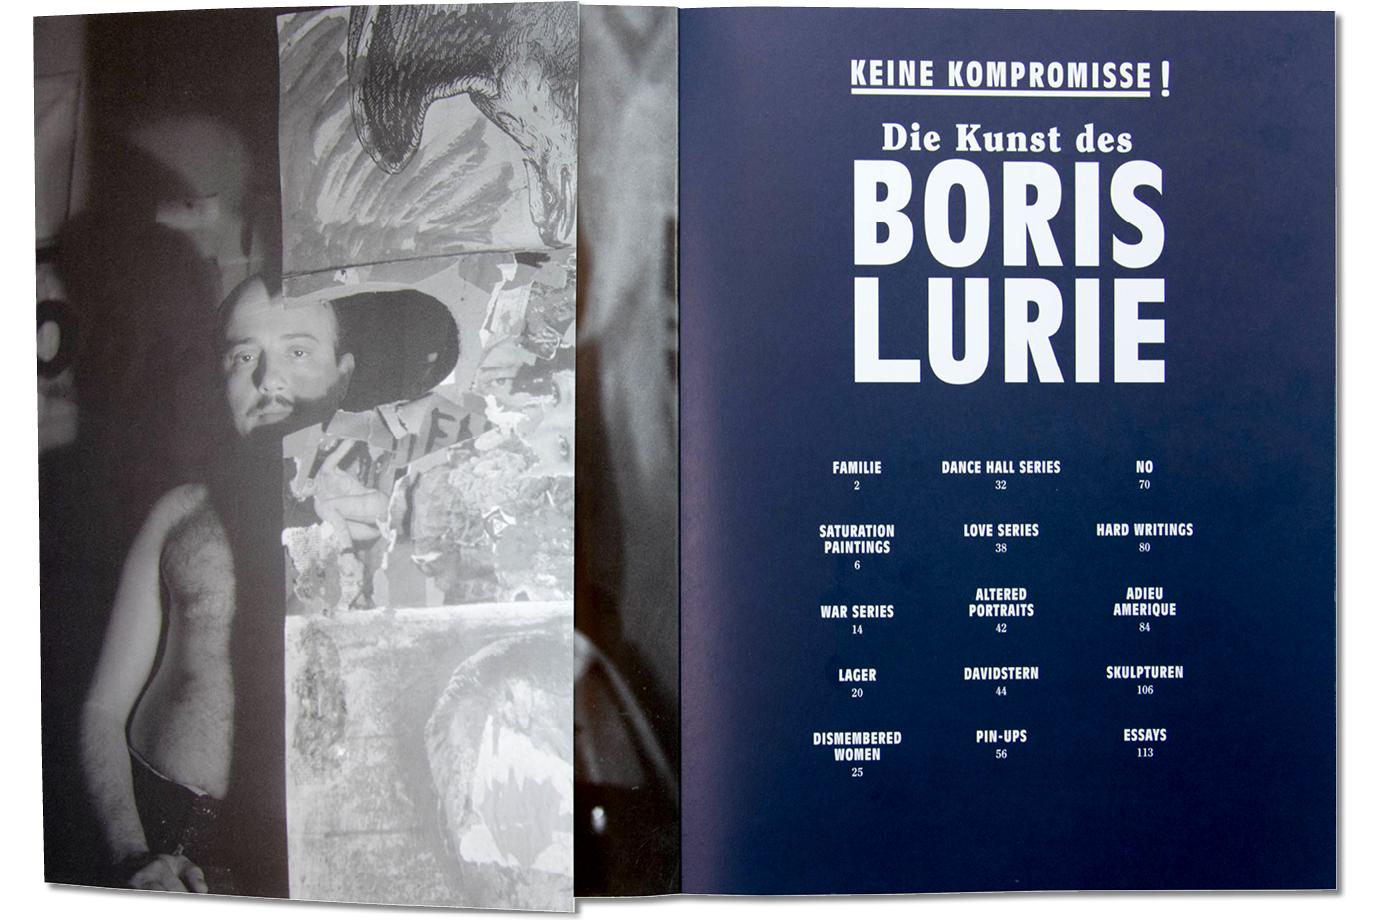 http://e-o-t.de/wordpress/wp-content/uploads/2017/03/Slide-Book_Lurie_2.jpg